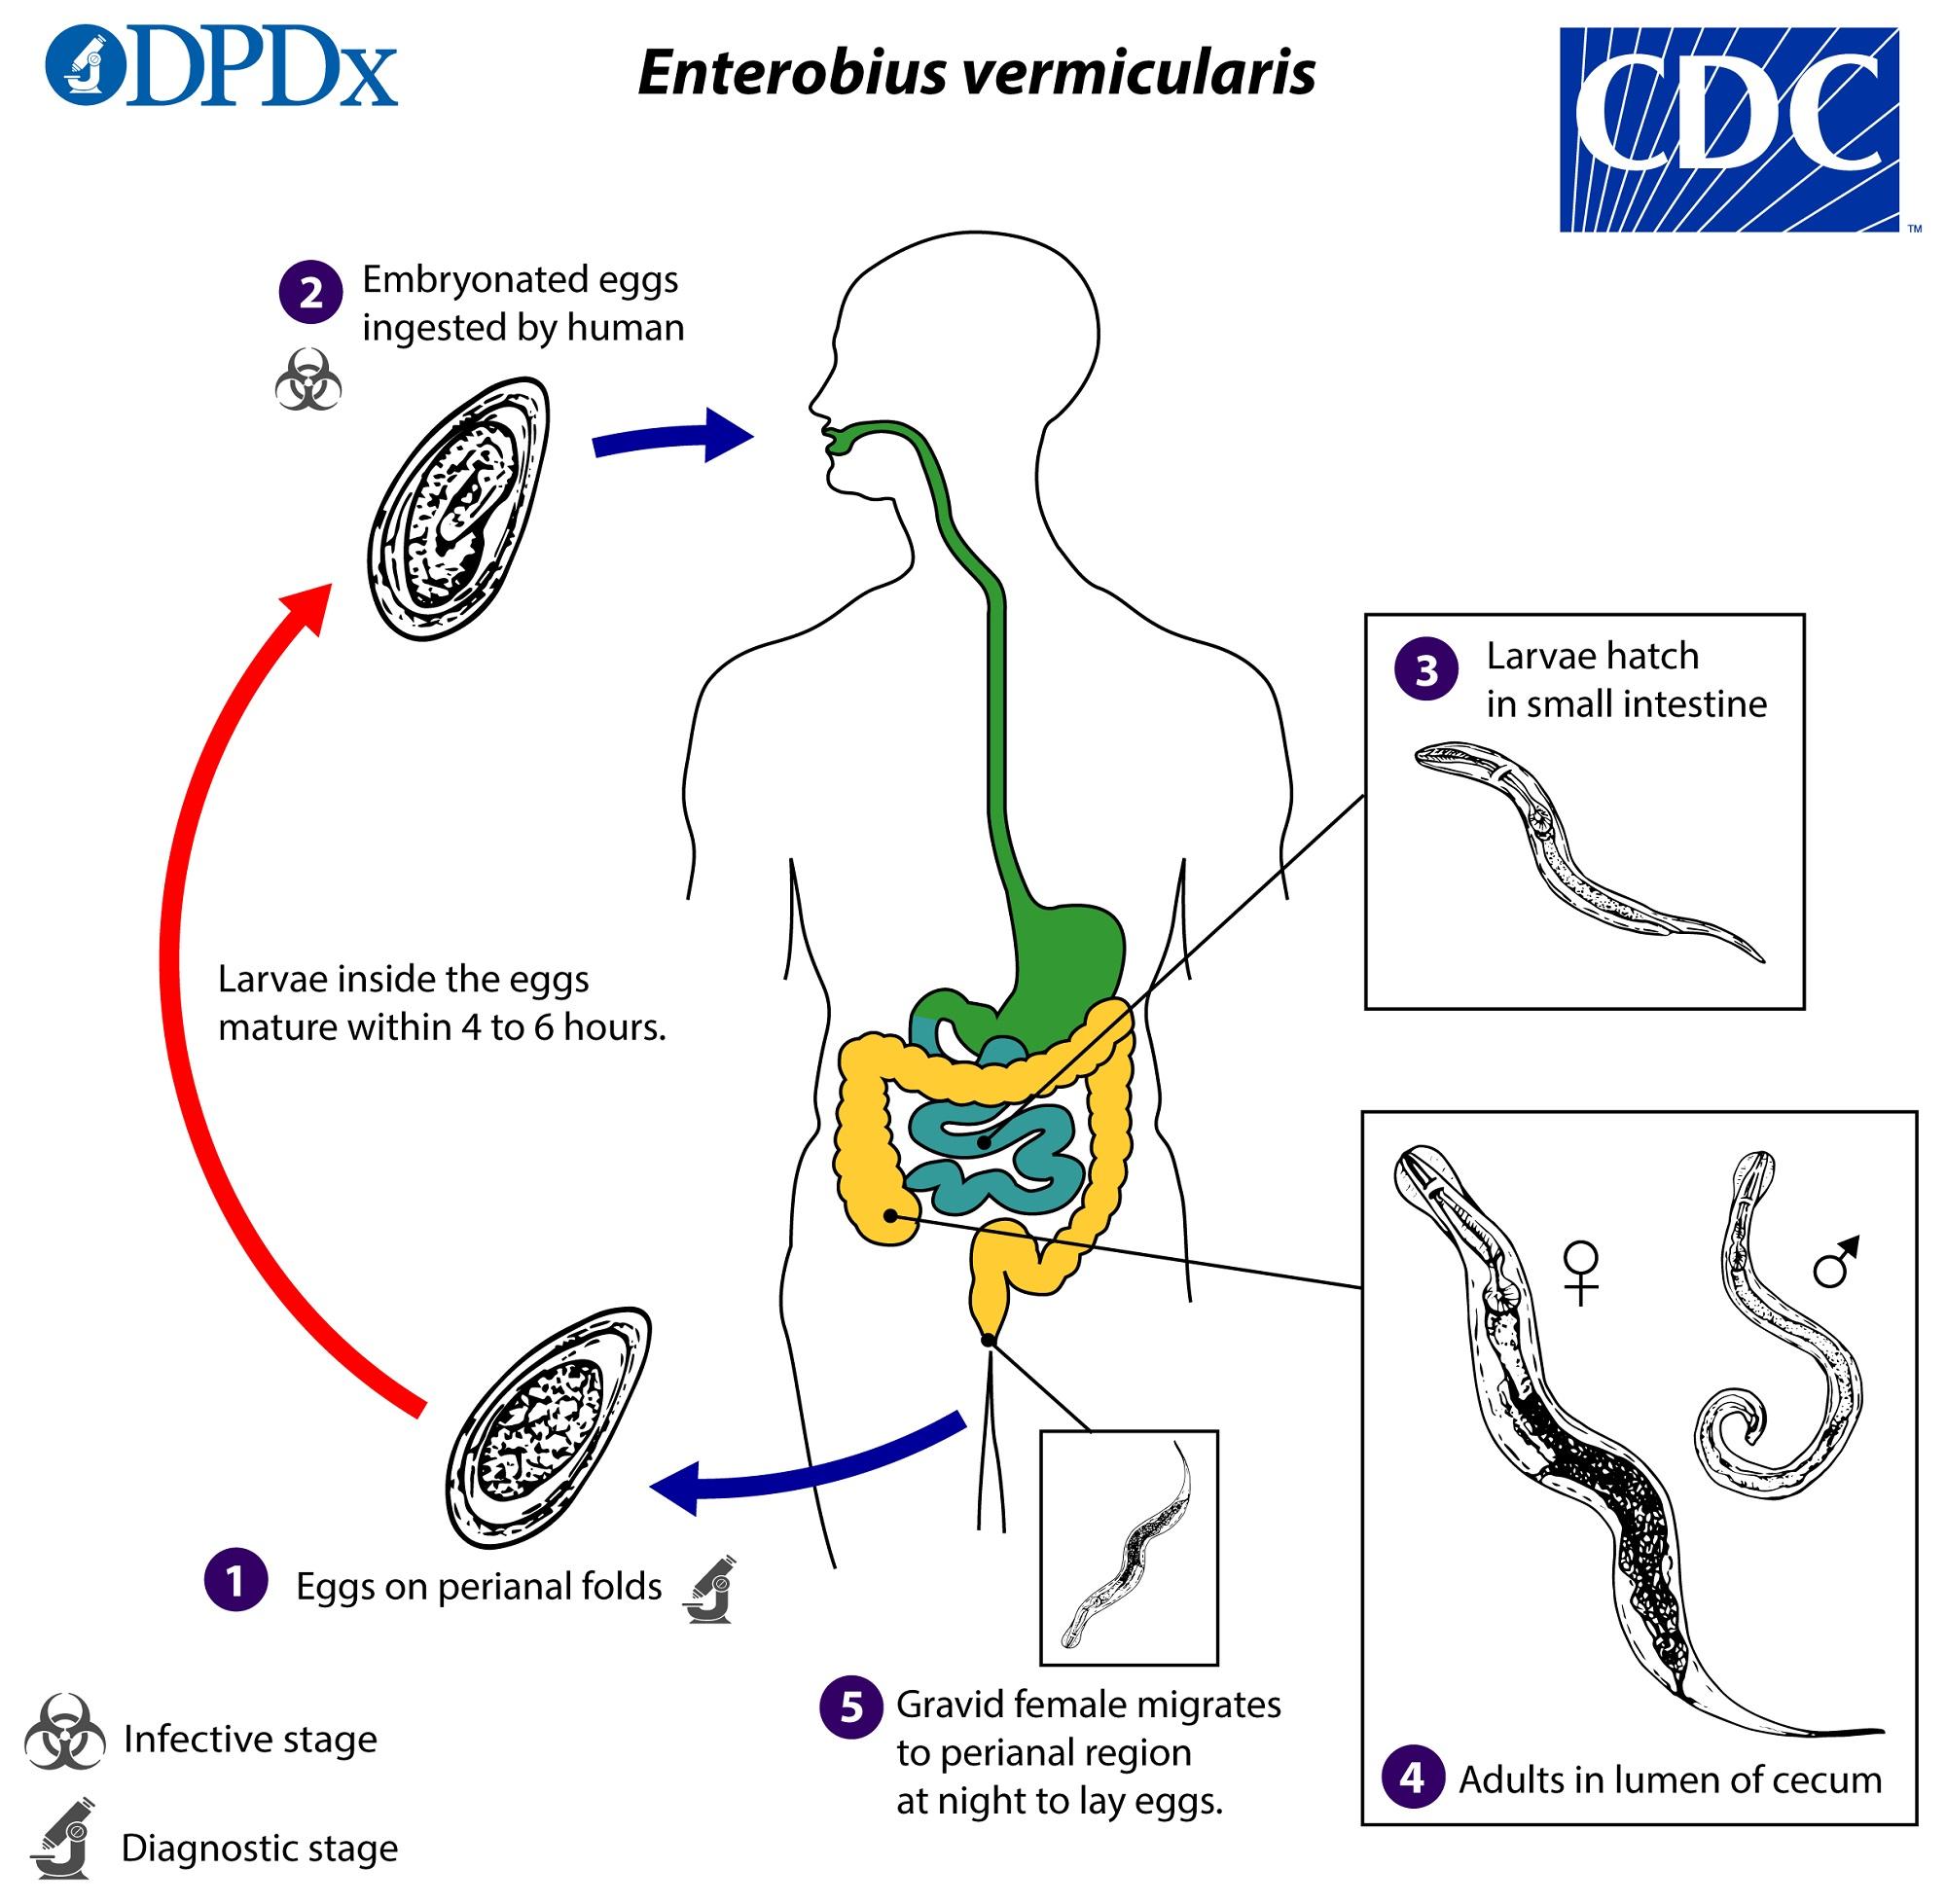 autoinfection in enterobiasis ciuperci fierte cu usturoi